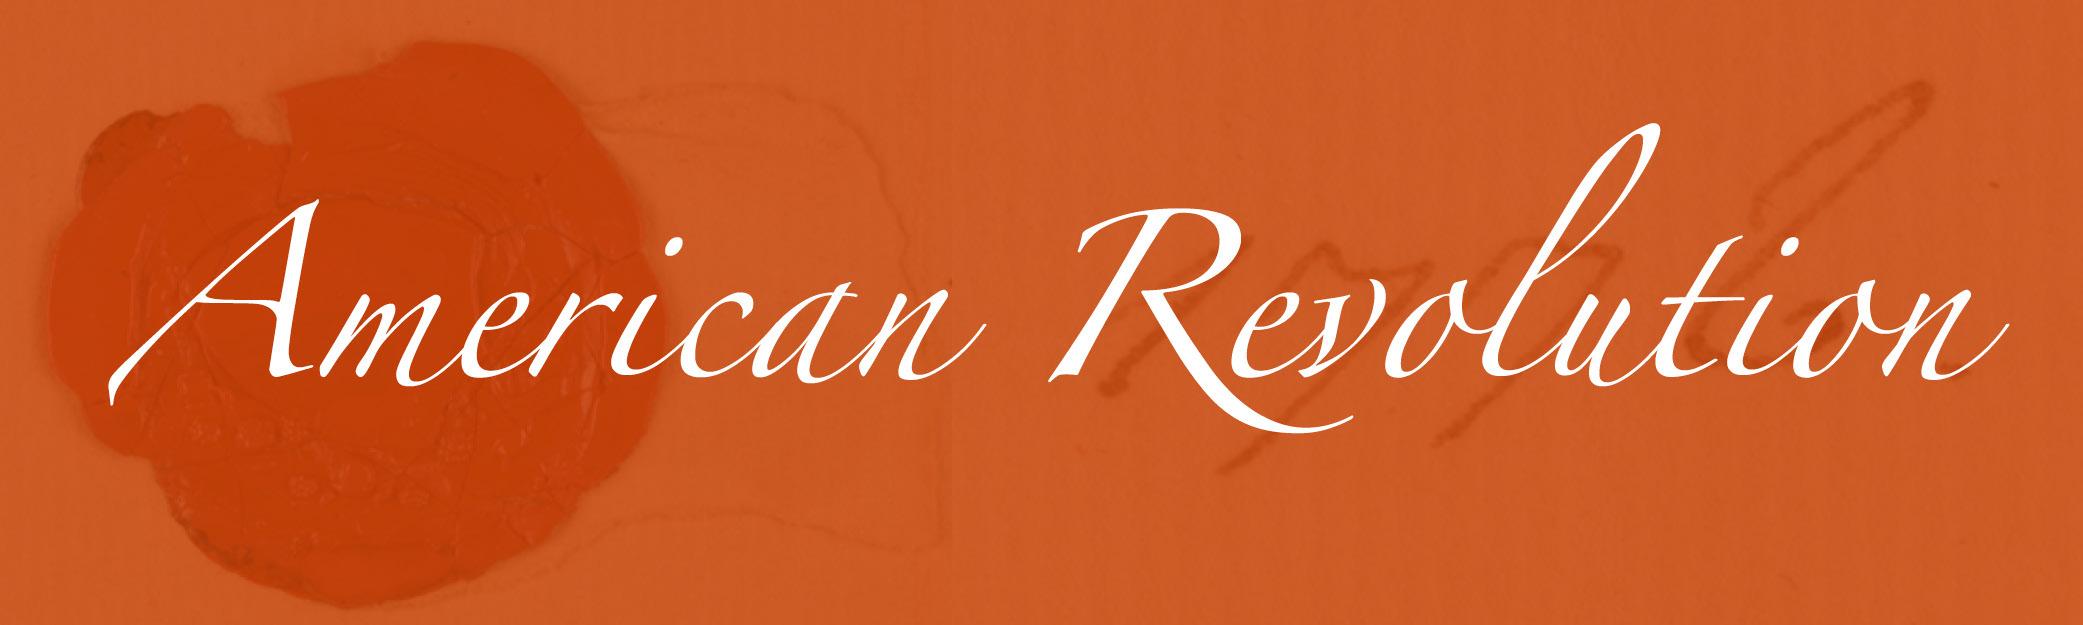 American Revolution Banner